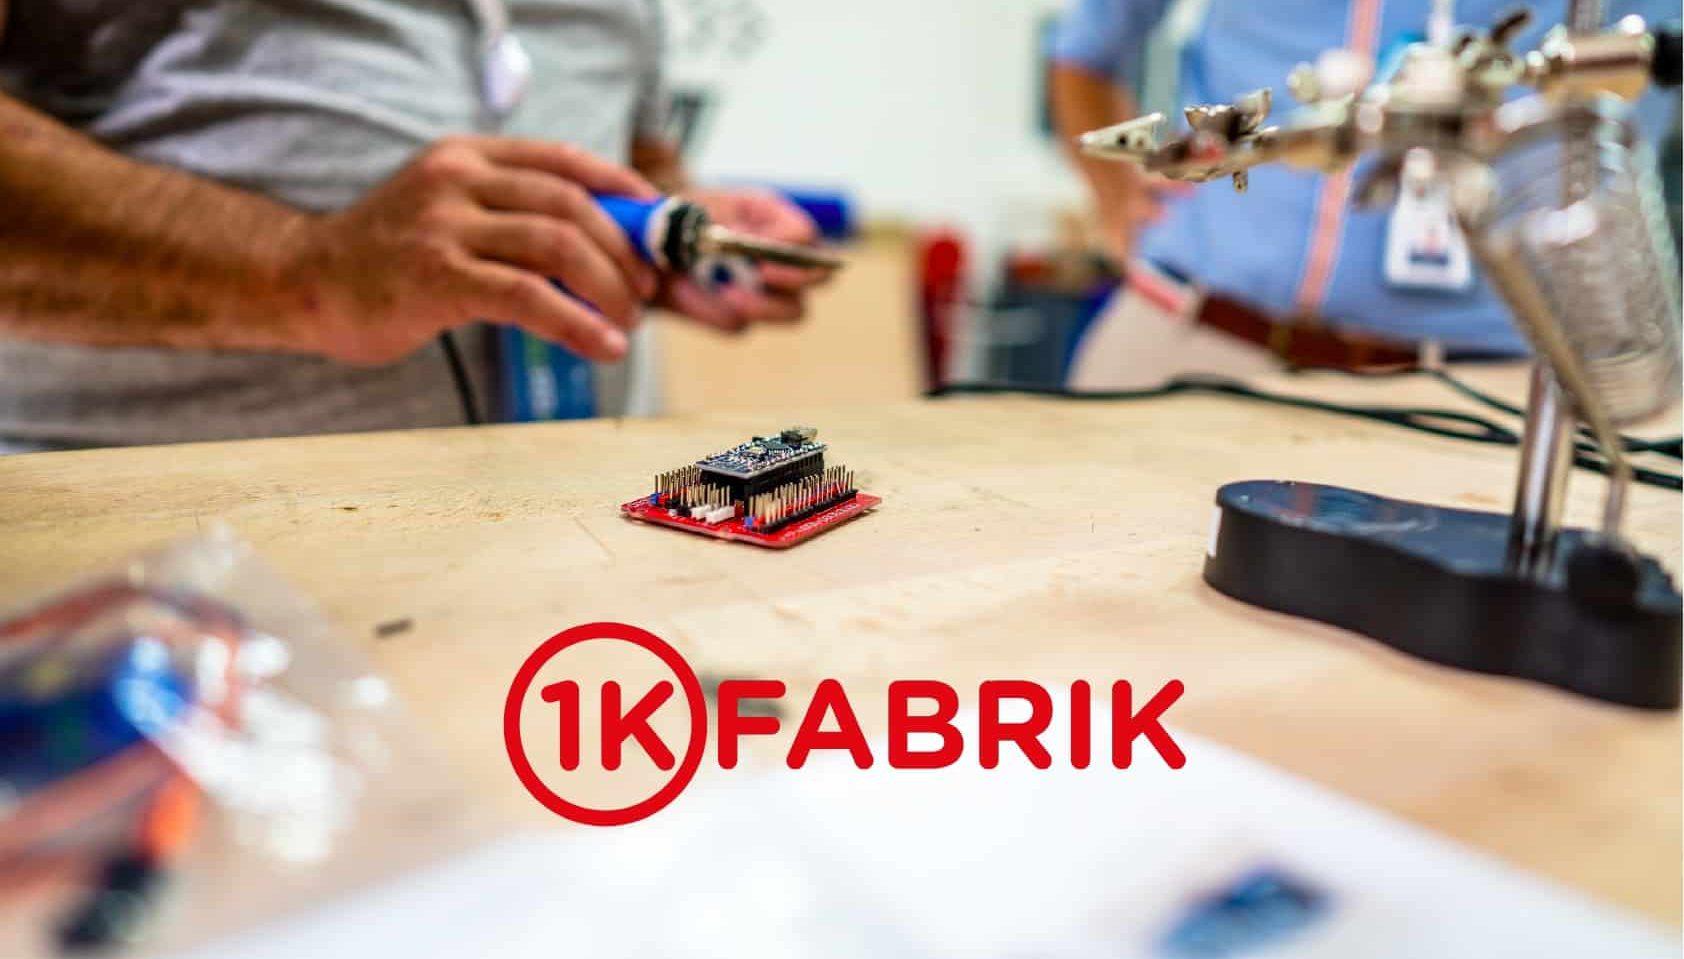 programme 1KFABRIK startup IOT